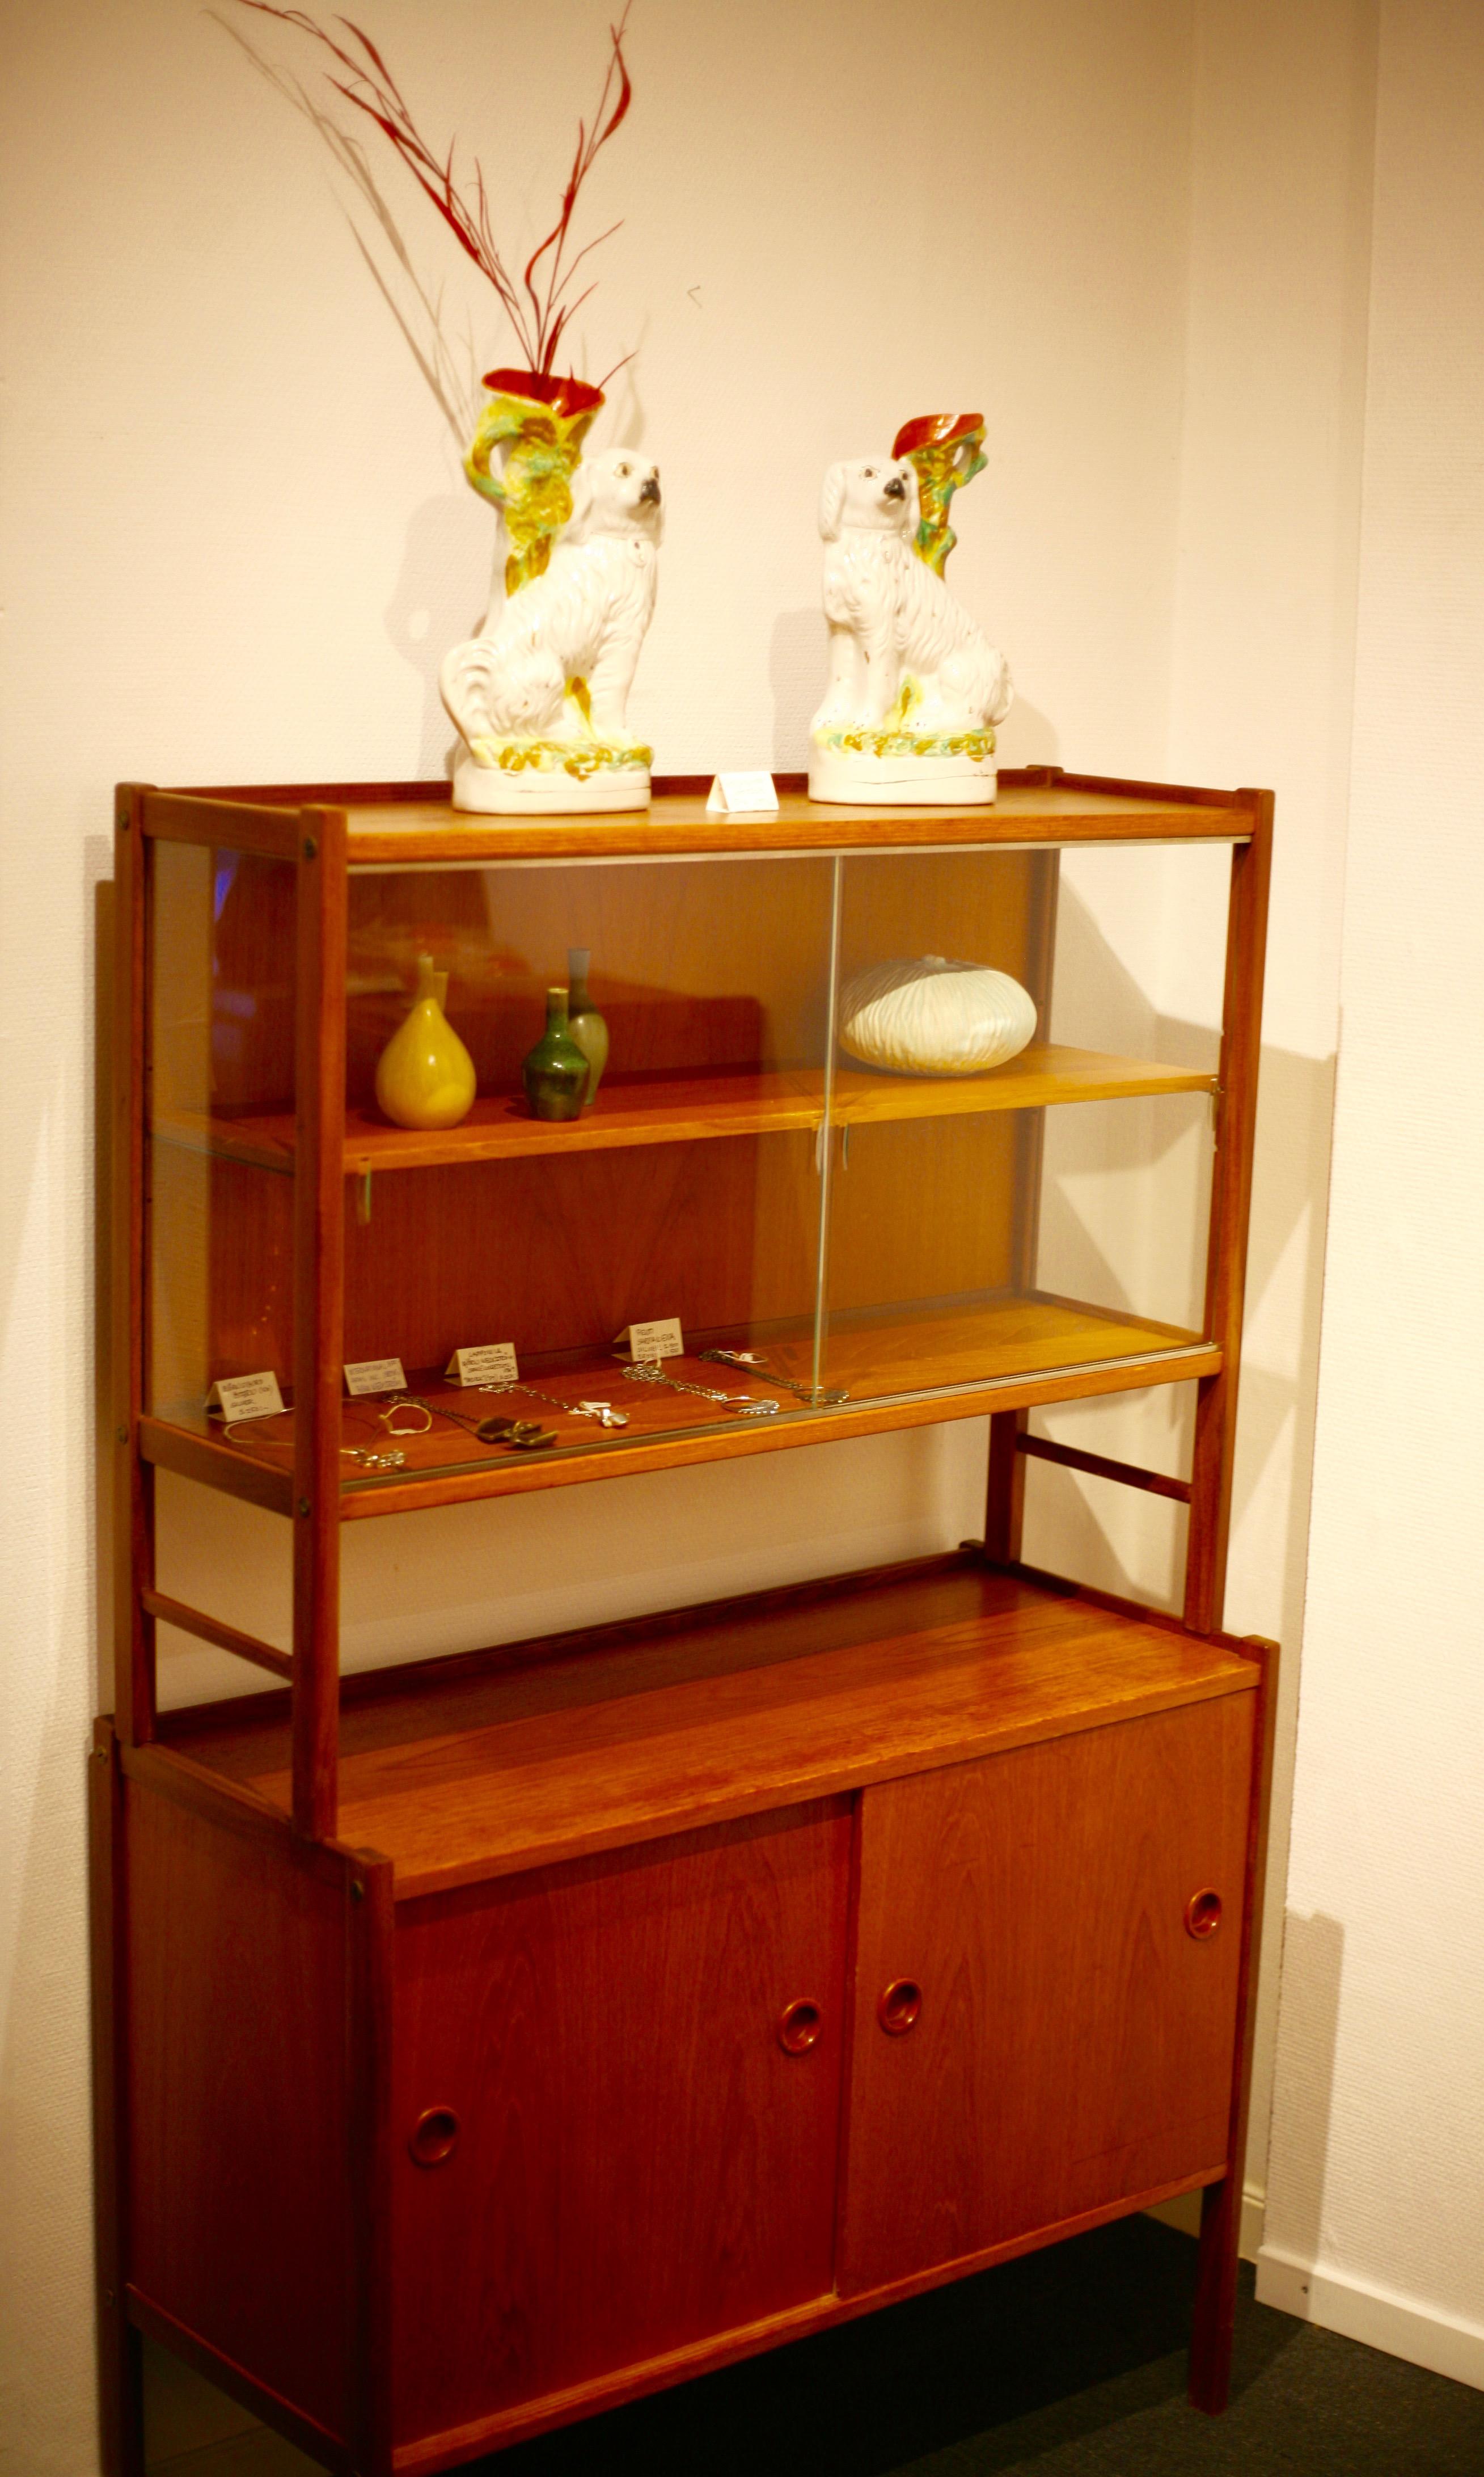 Vitrine cupboard